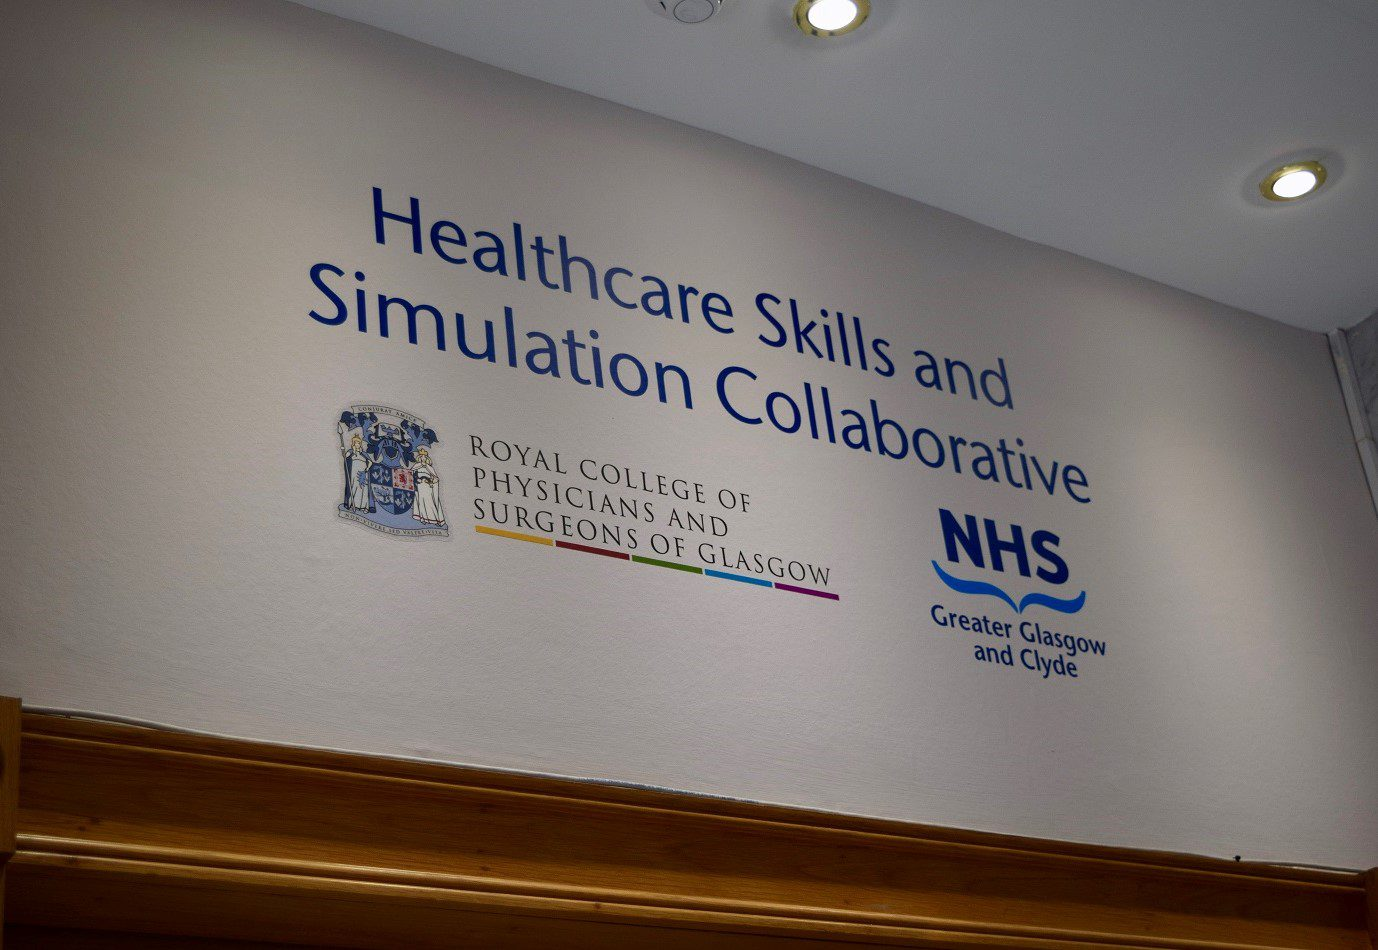 Medical training partnership announced in Glasgow